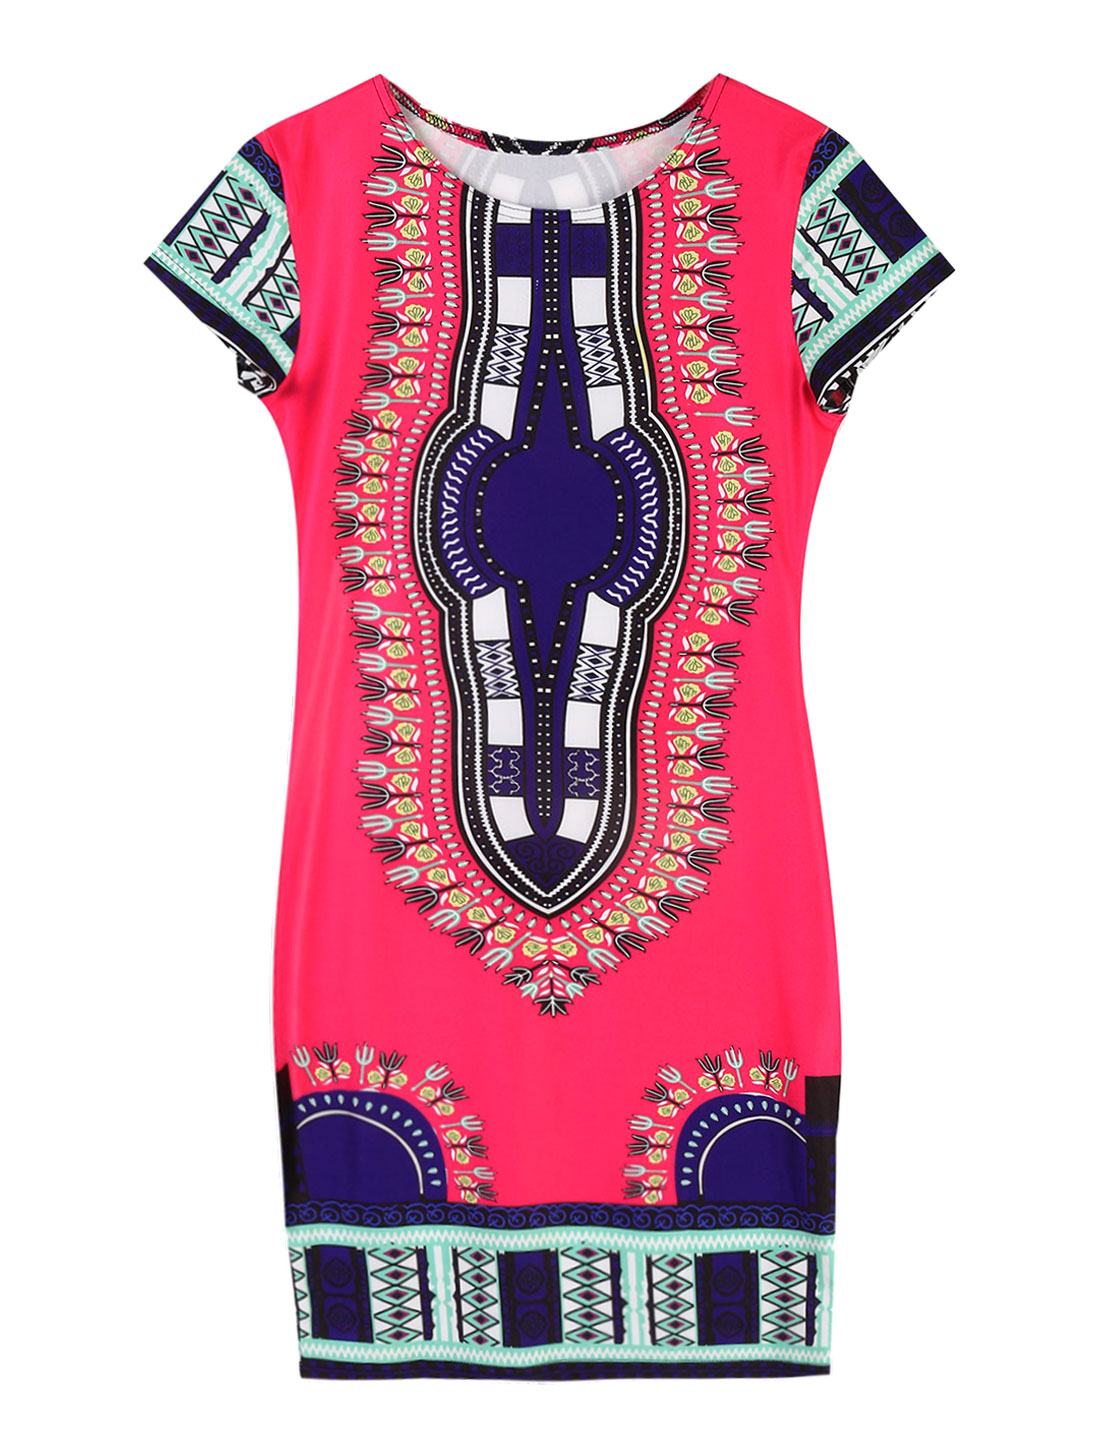 Women Floral Novelty Prints Short Sleeve Sheath T-Shirt Dress Pink M